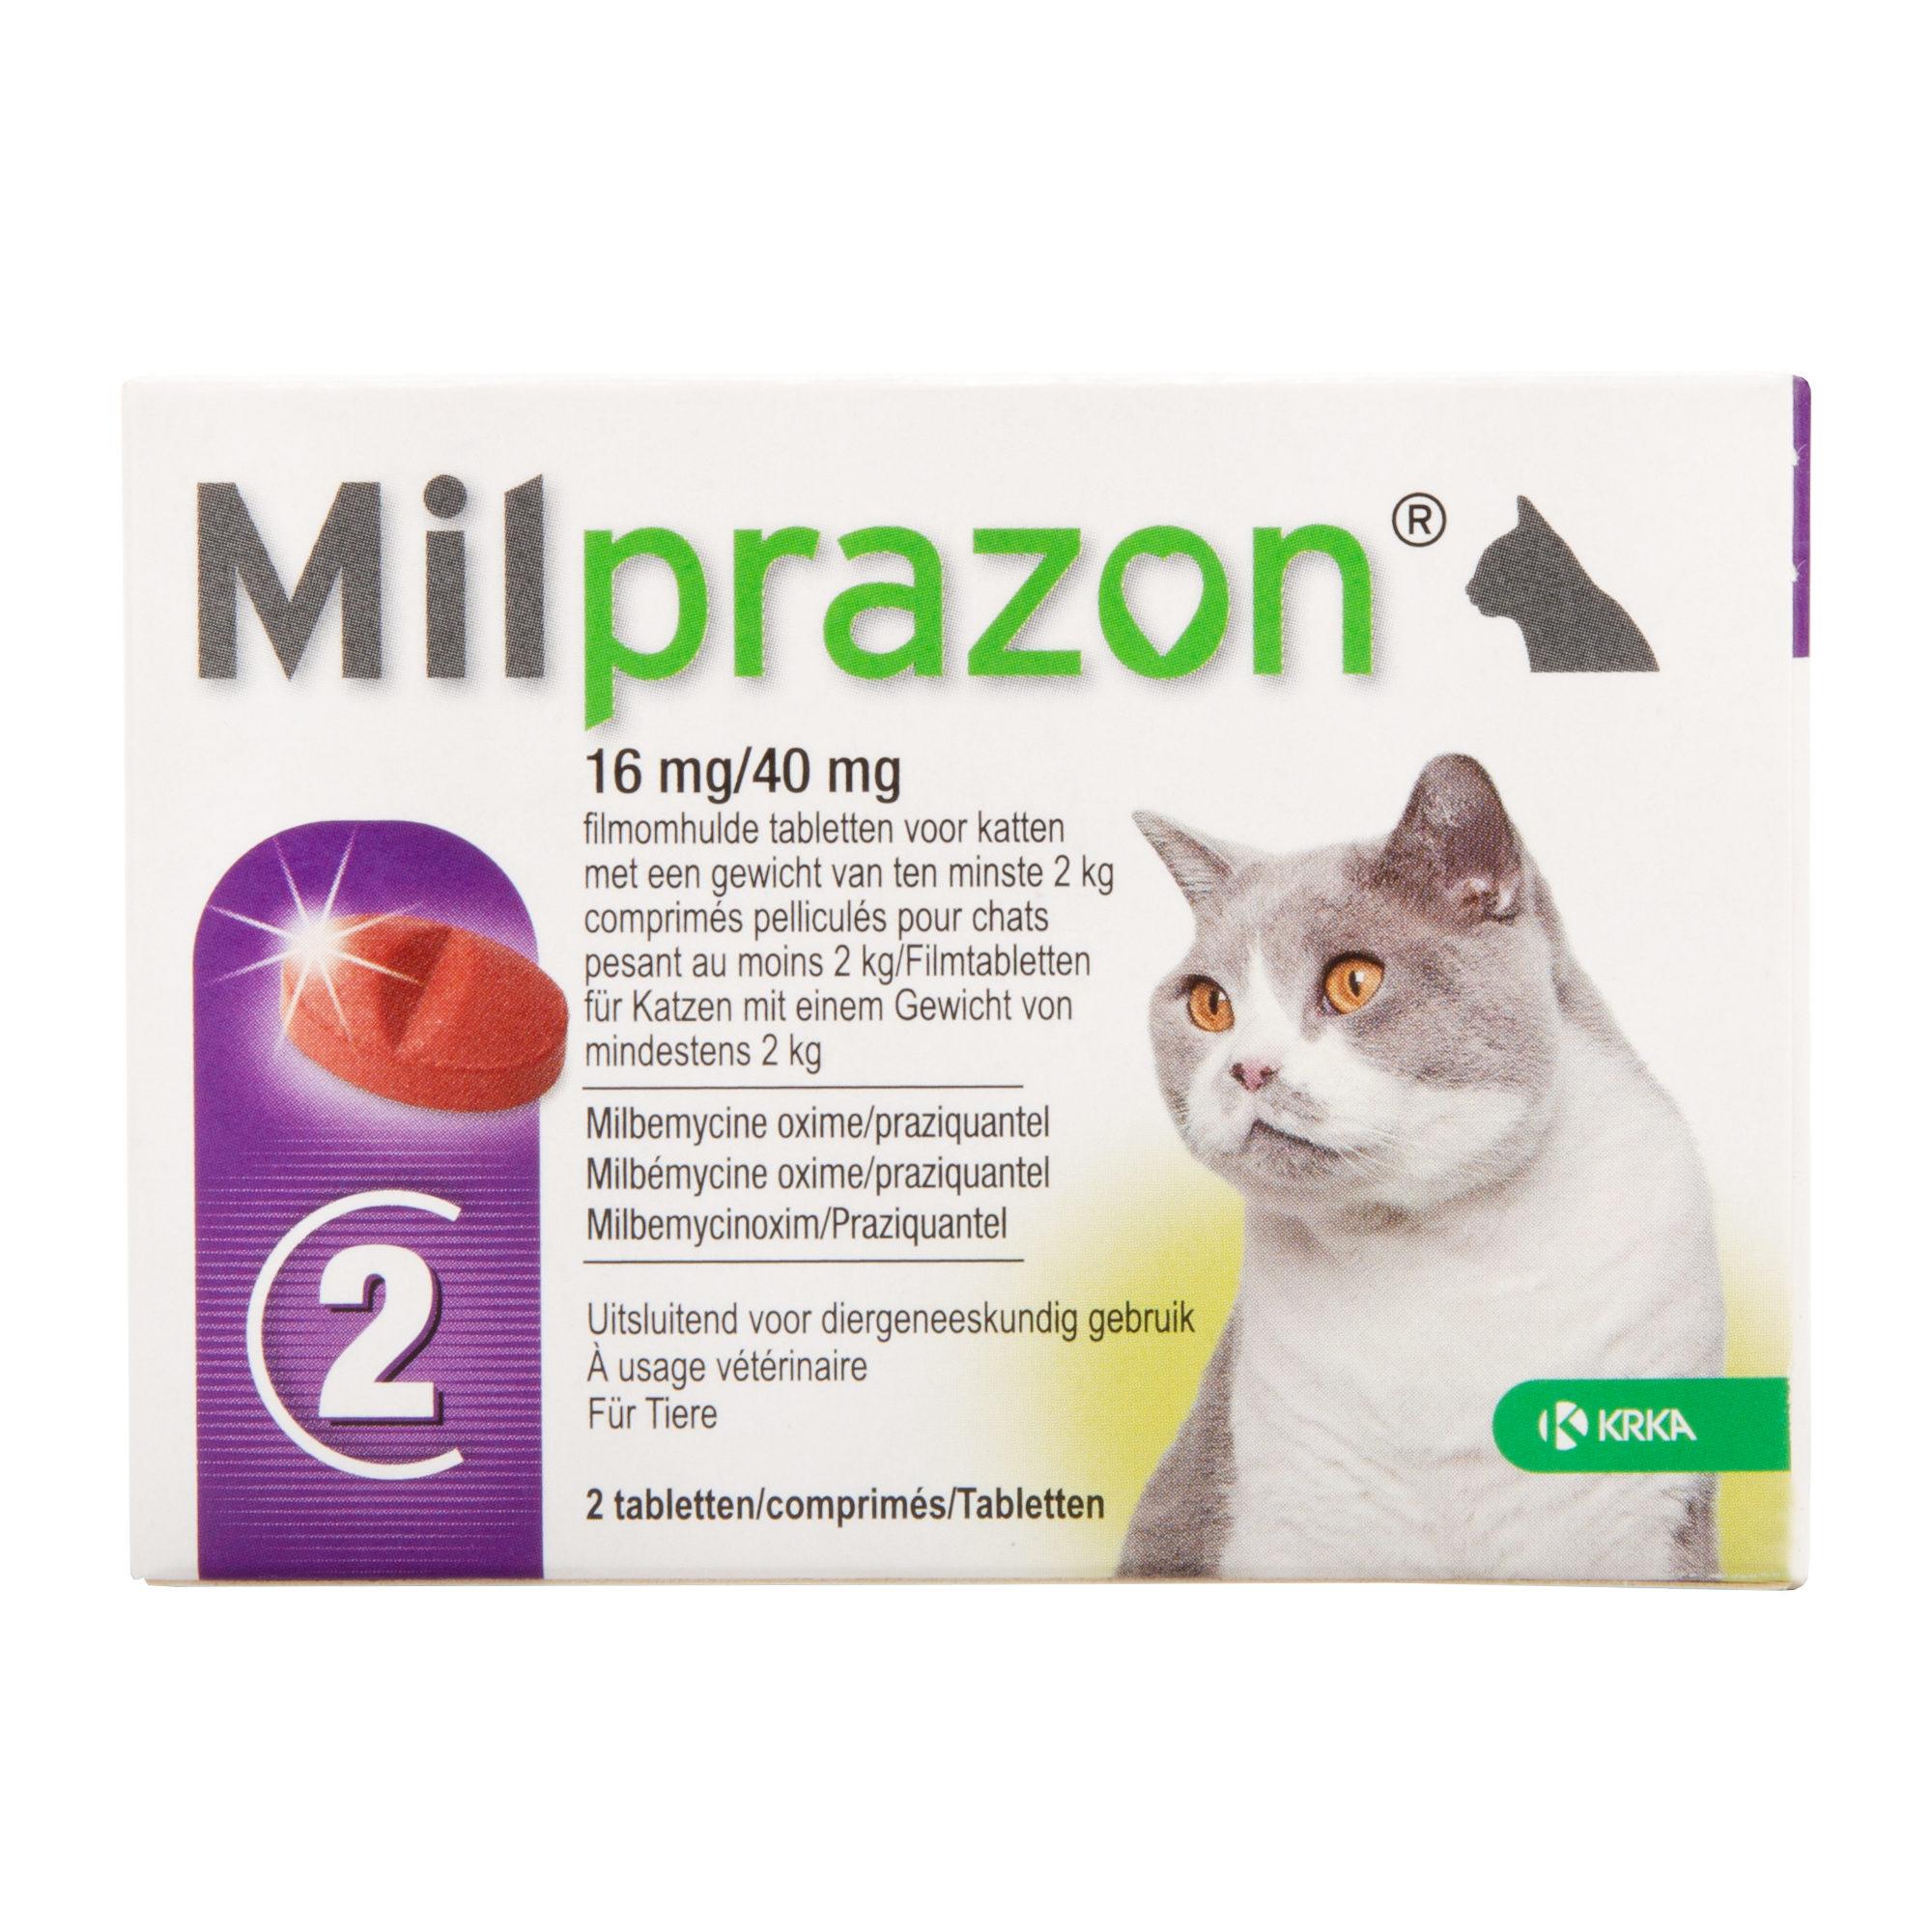 Milprazon - große Katze (16 mg)